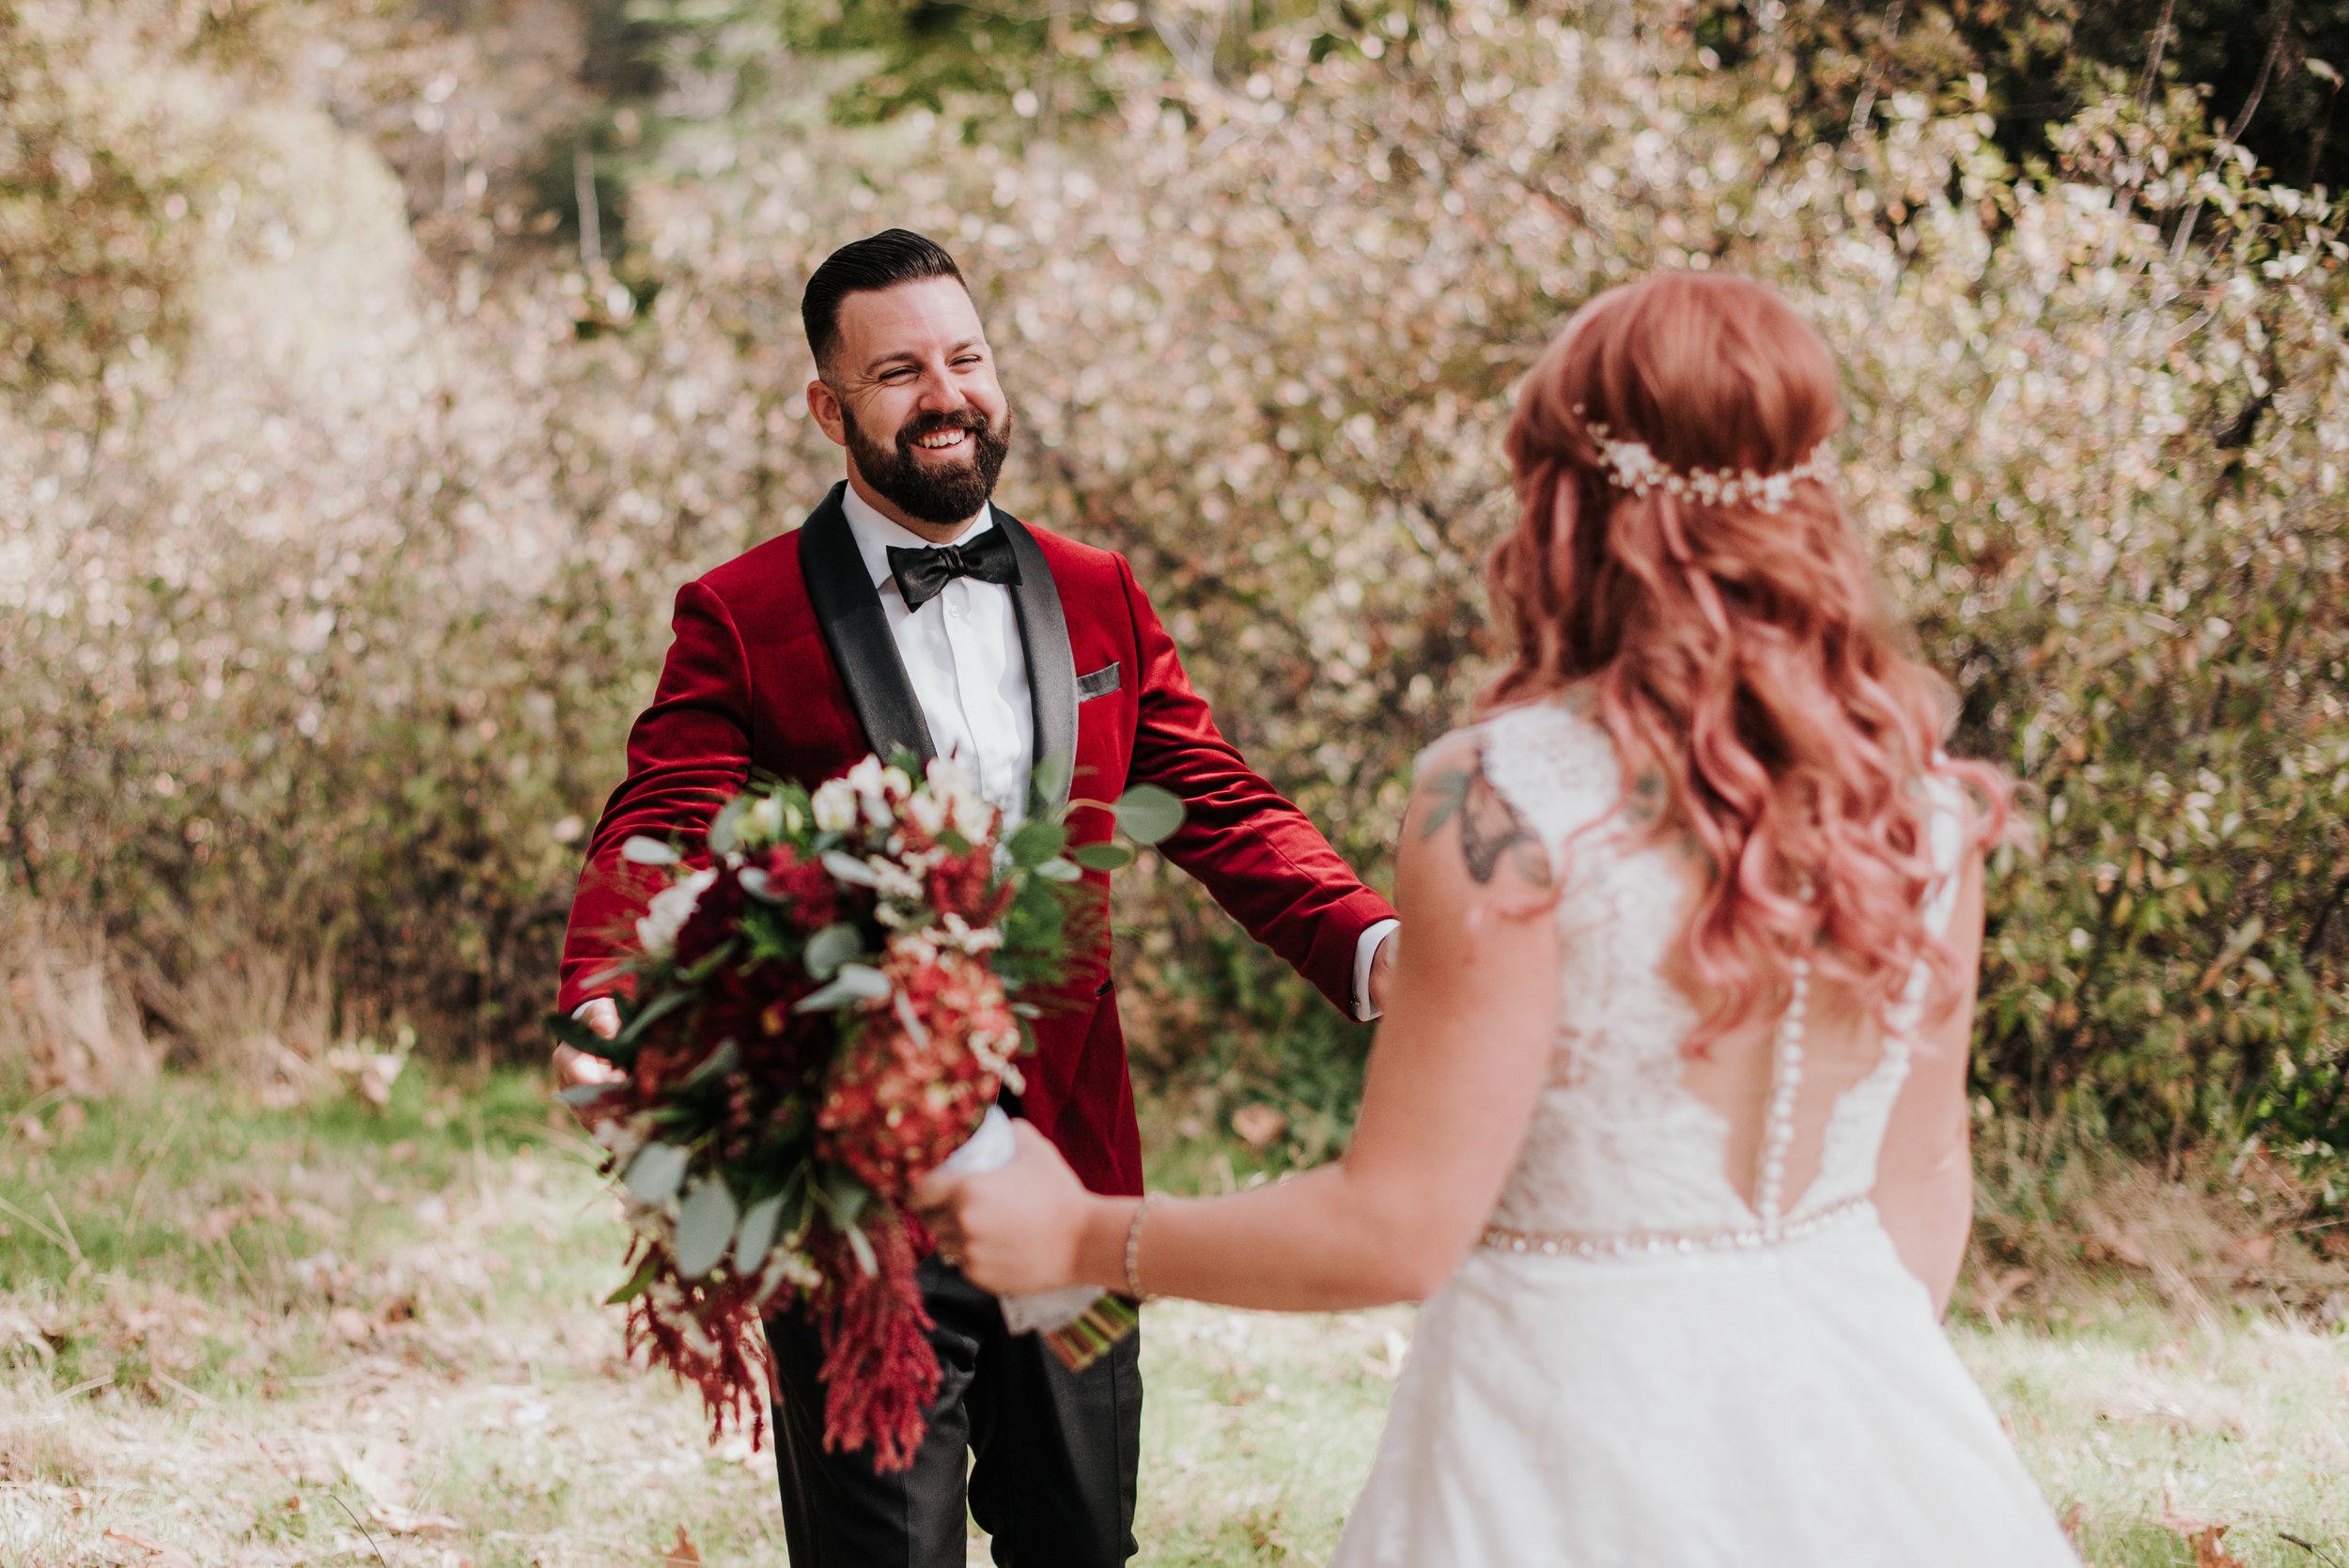 2018-11-04 Maresa and Nick - Married - Oak Glen-203.jpg